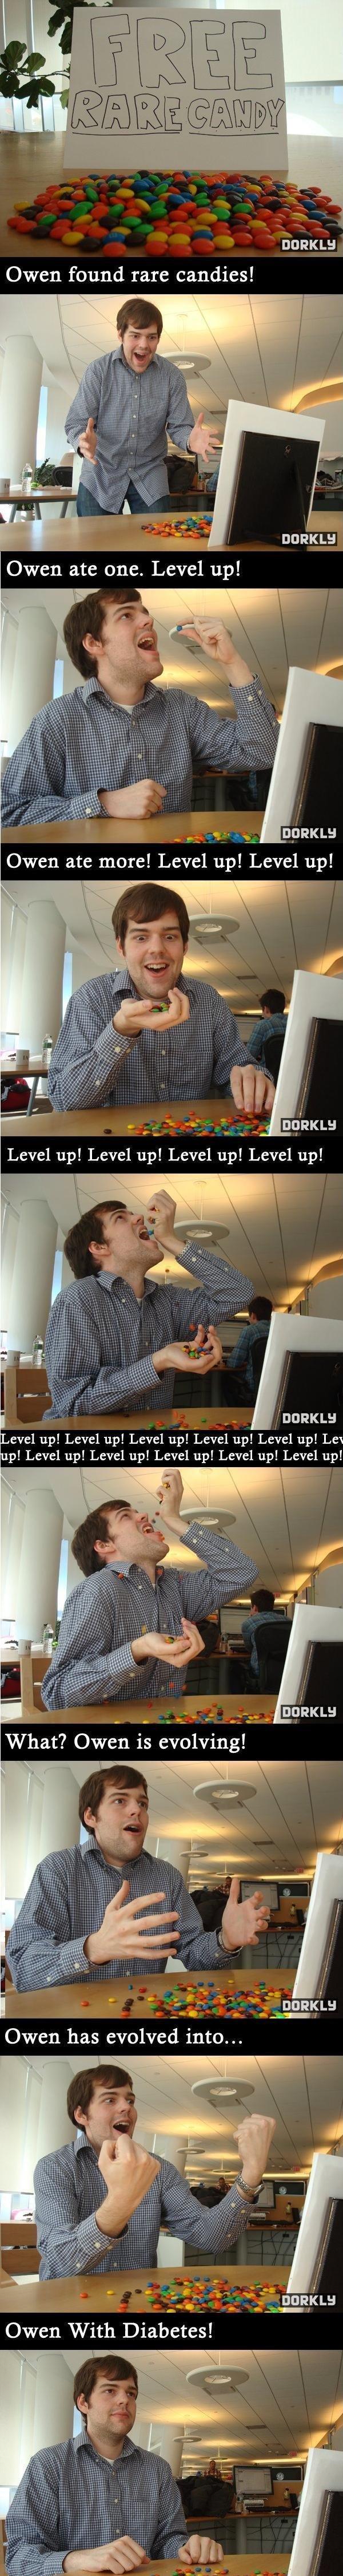 "Rare candy problems. . DARKLY Owen found rare candies! DARYLB Owen ate more! Level up! Level up! g"" ious Level up! Level up! Level up! Level up! I evel up! Leve"